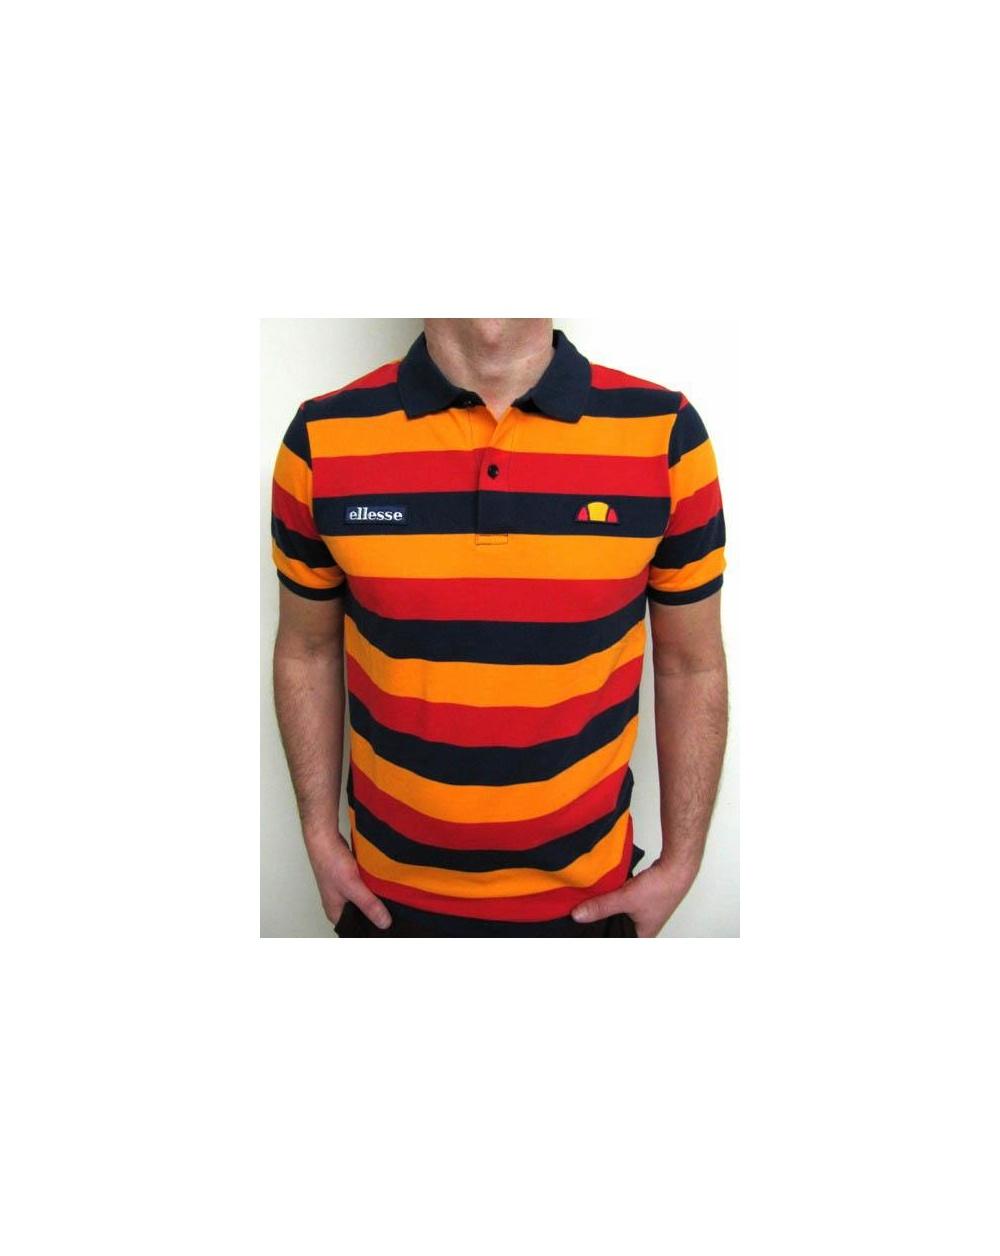 827290ccc6f Ellesse Grand Rousses Polo Shirt Navy/Orange/Red - Ellesse vintage ...